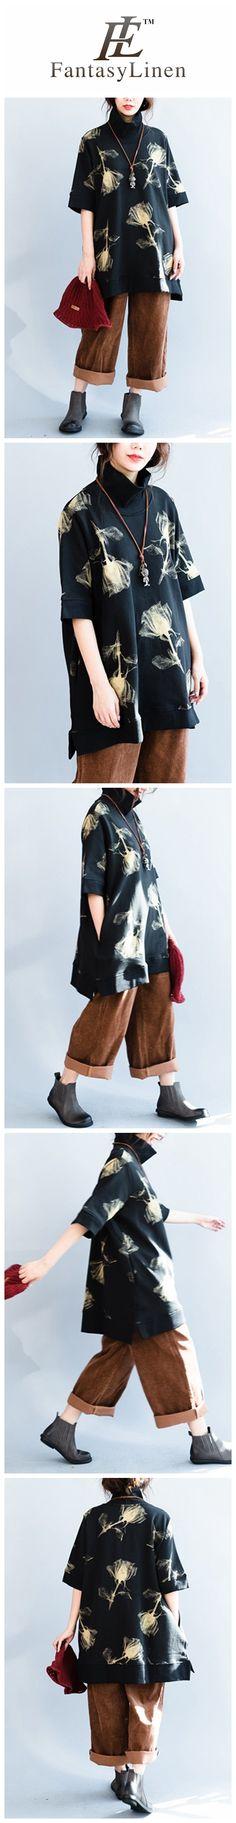 Black Cotton High Collar Loose Fleece Dress Shirts Women Clothes Q7128